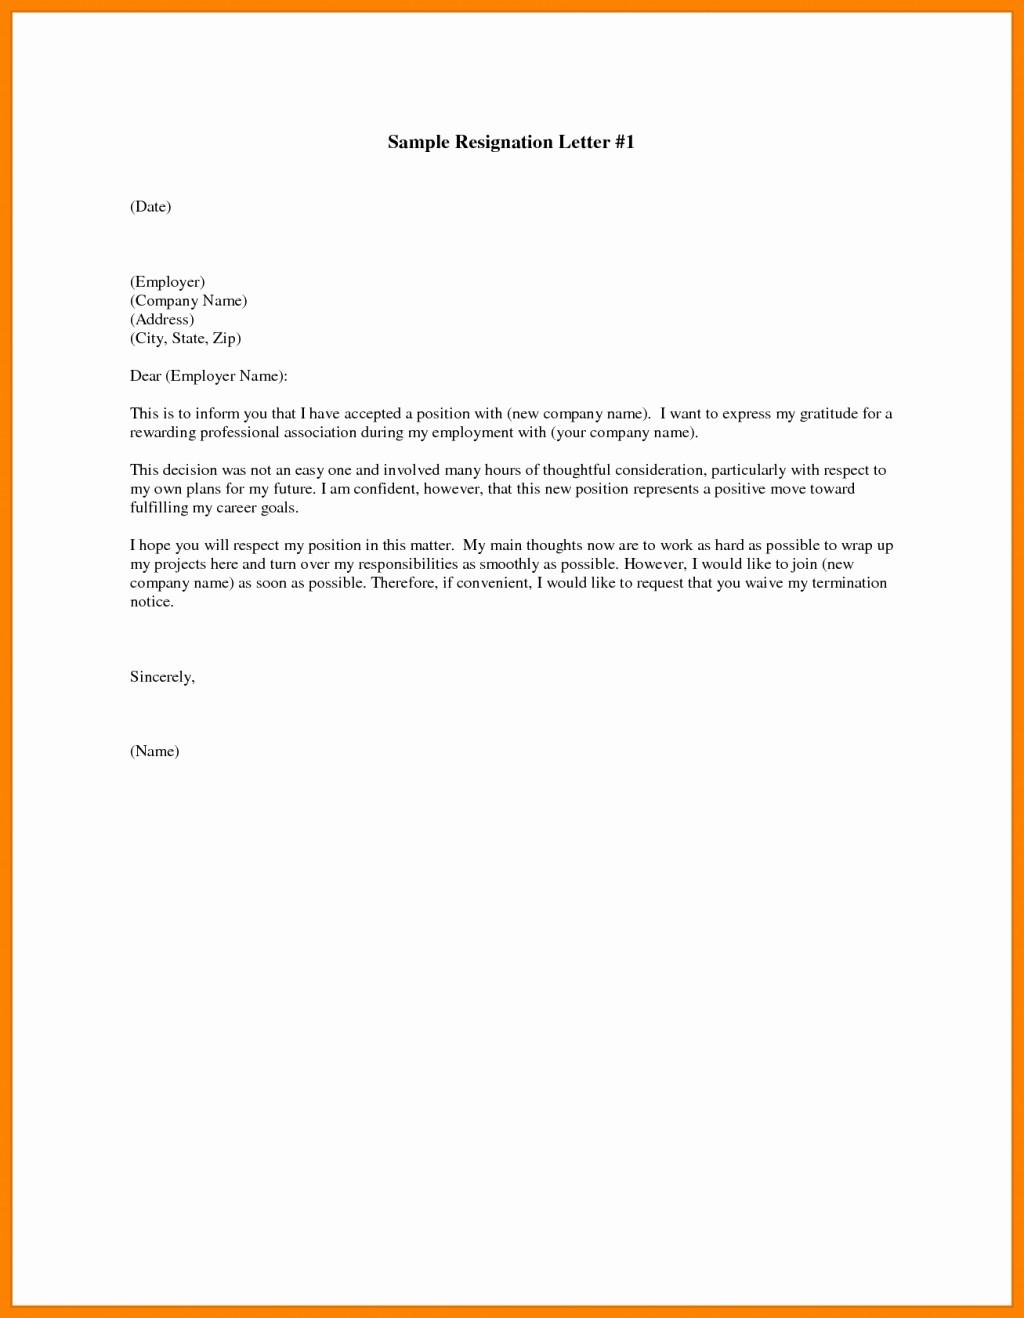 Formal Letter Template Microsoft Word Lovely Free Resignation Letter Template Microsoft Word Download